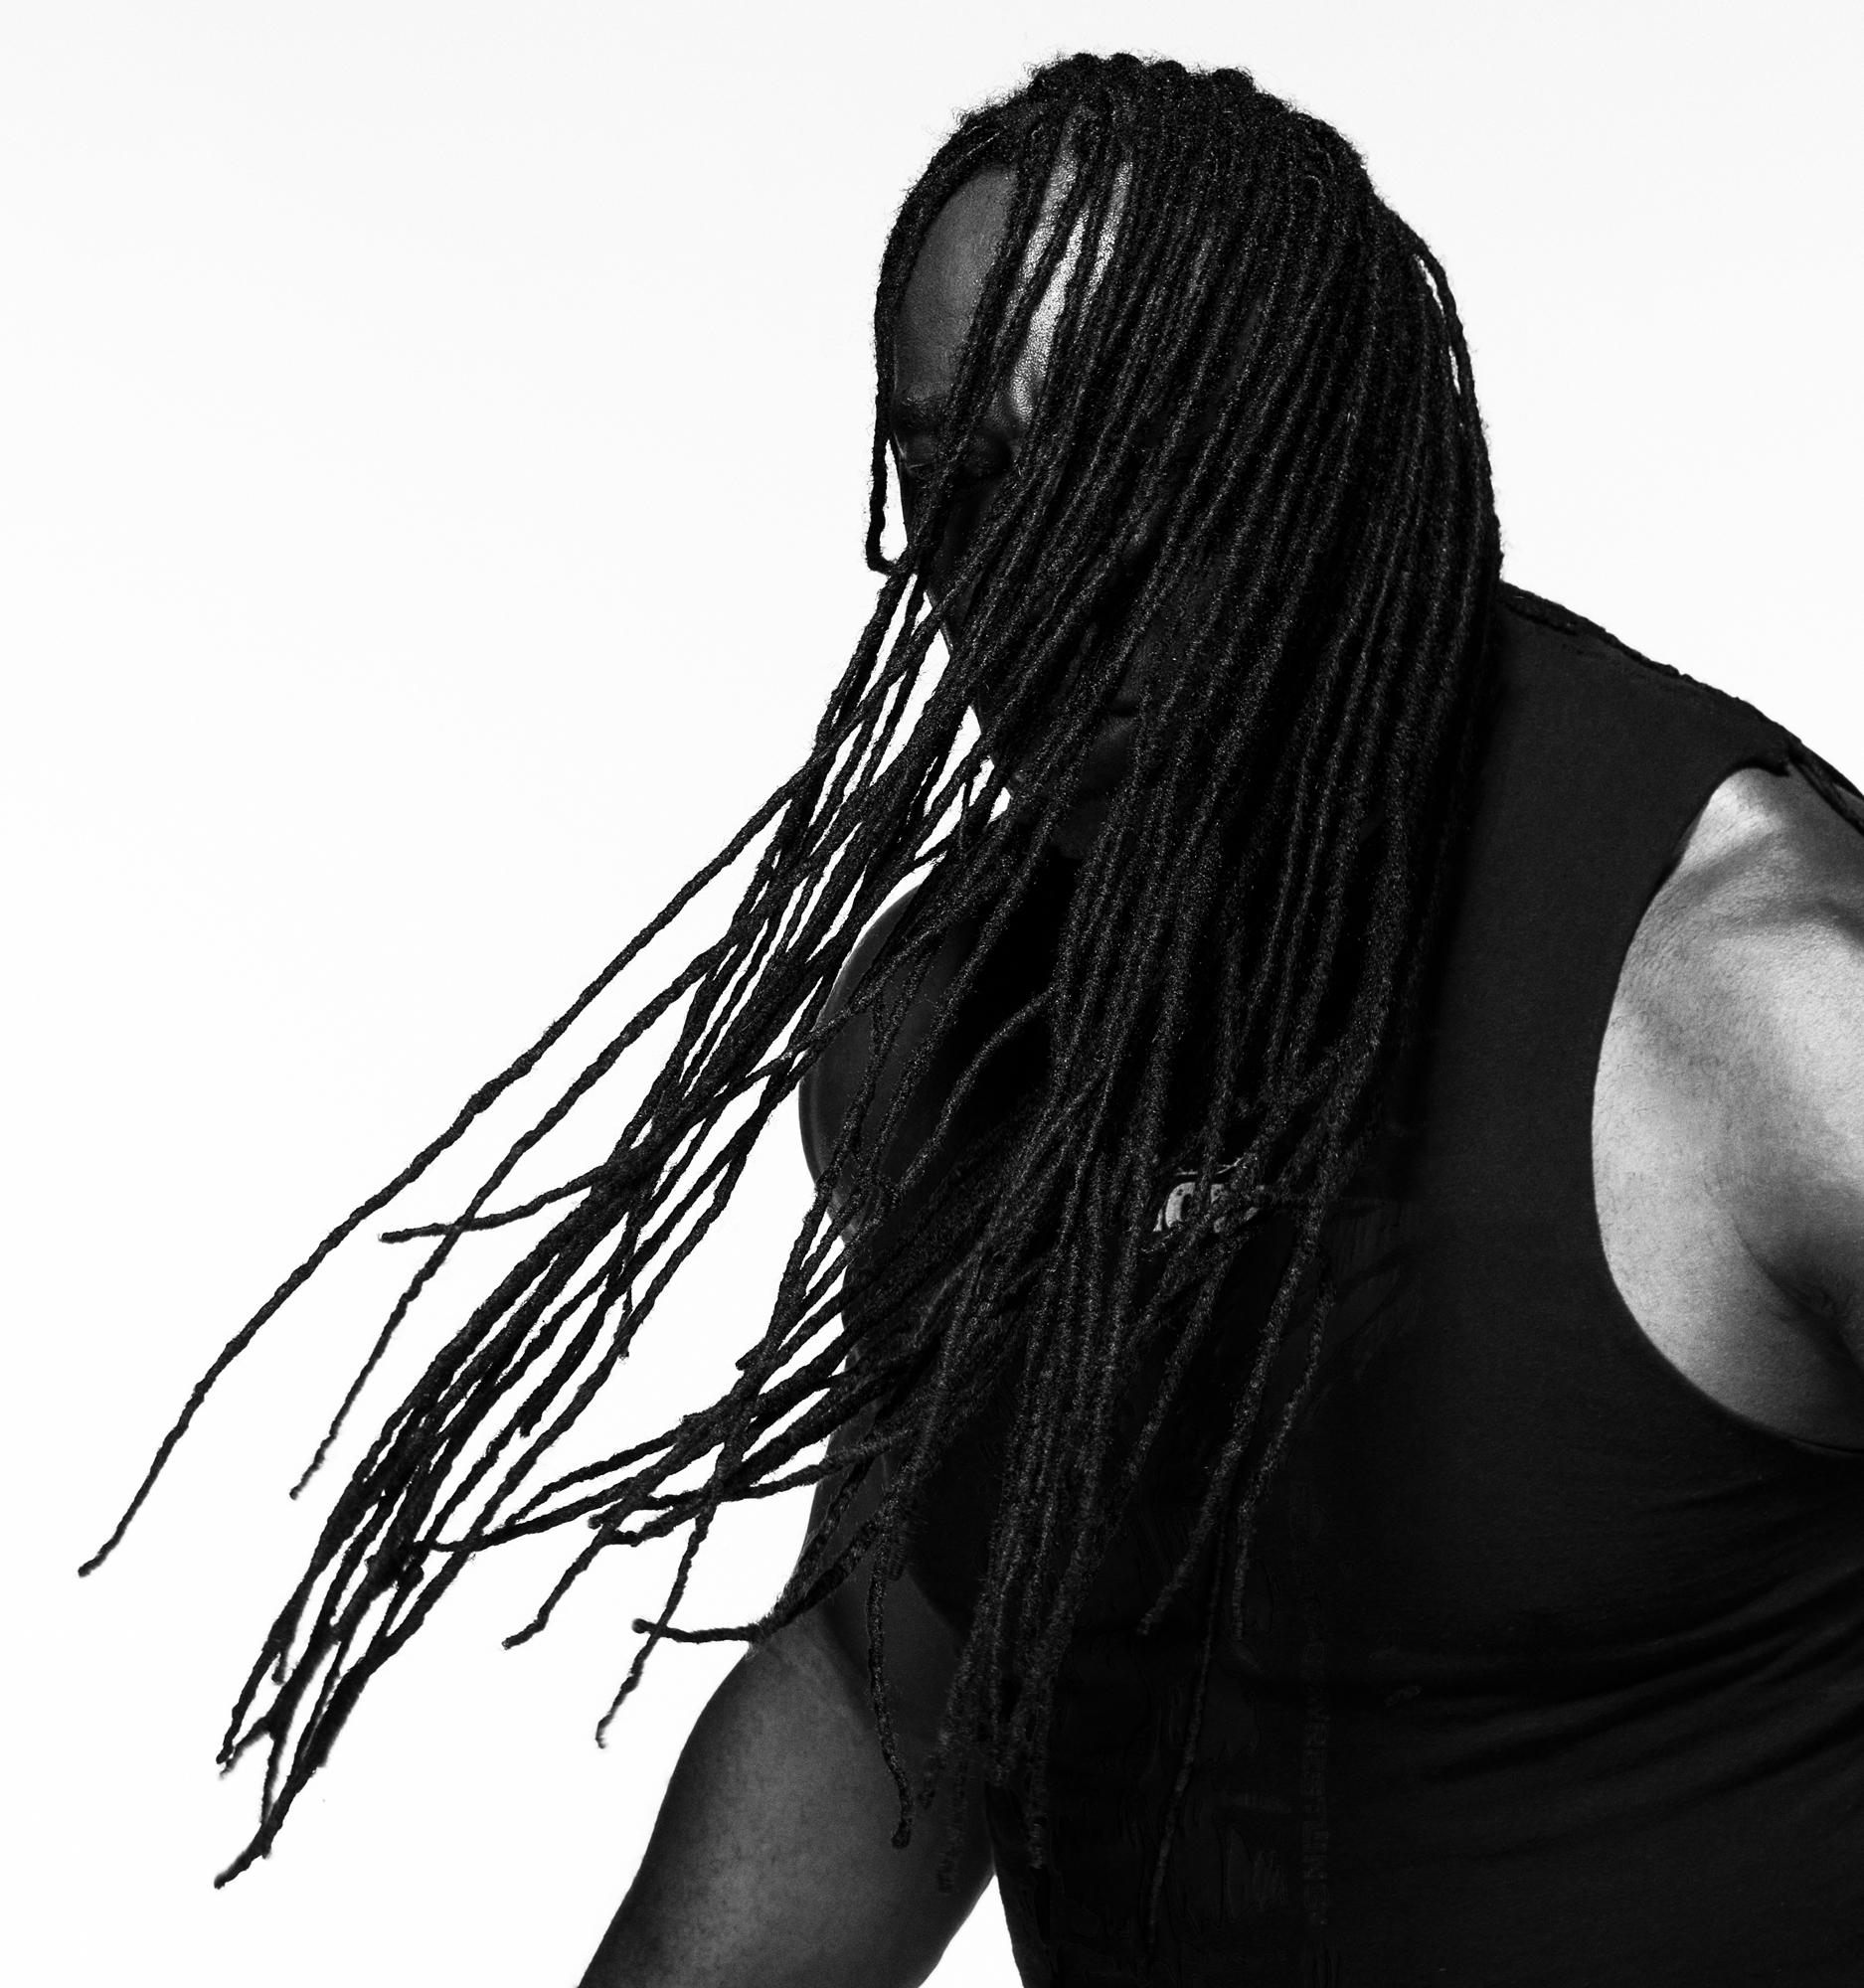 dcf4ca9f7 Professional wrestler Booker T's raw life